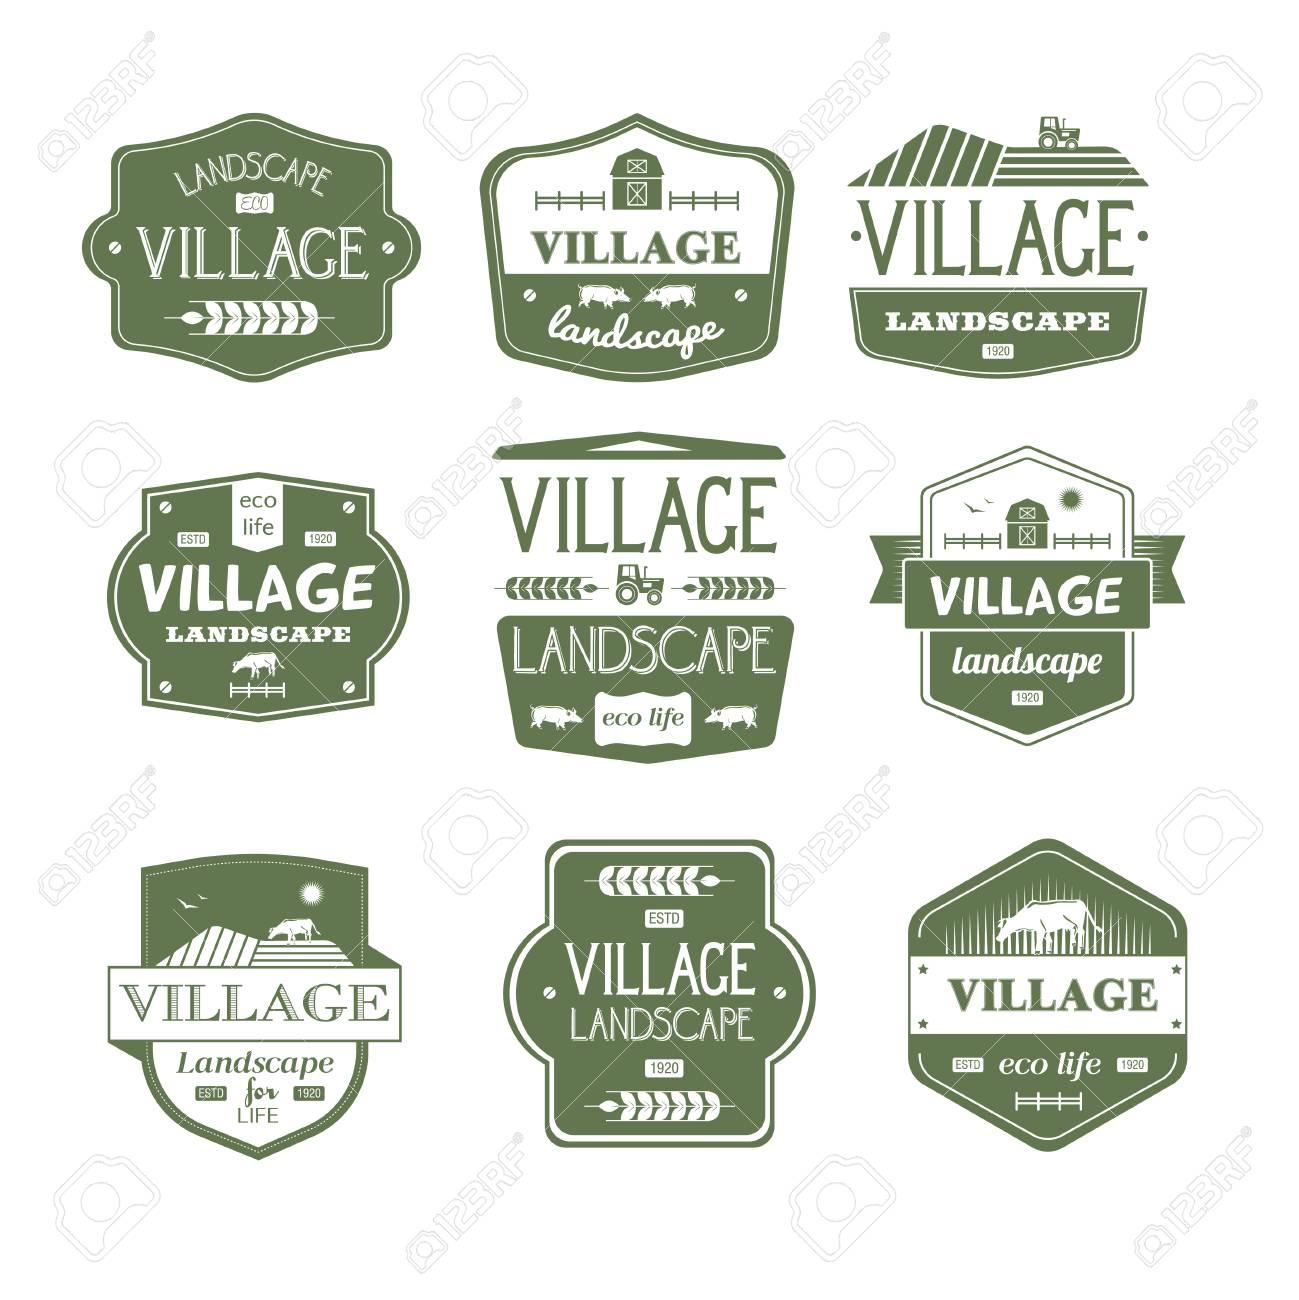 village life vintage vector set of logos royalty free cliparts